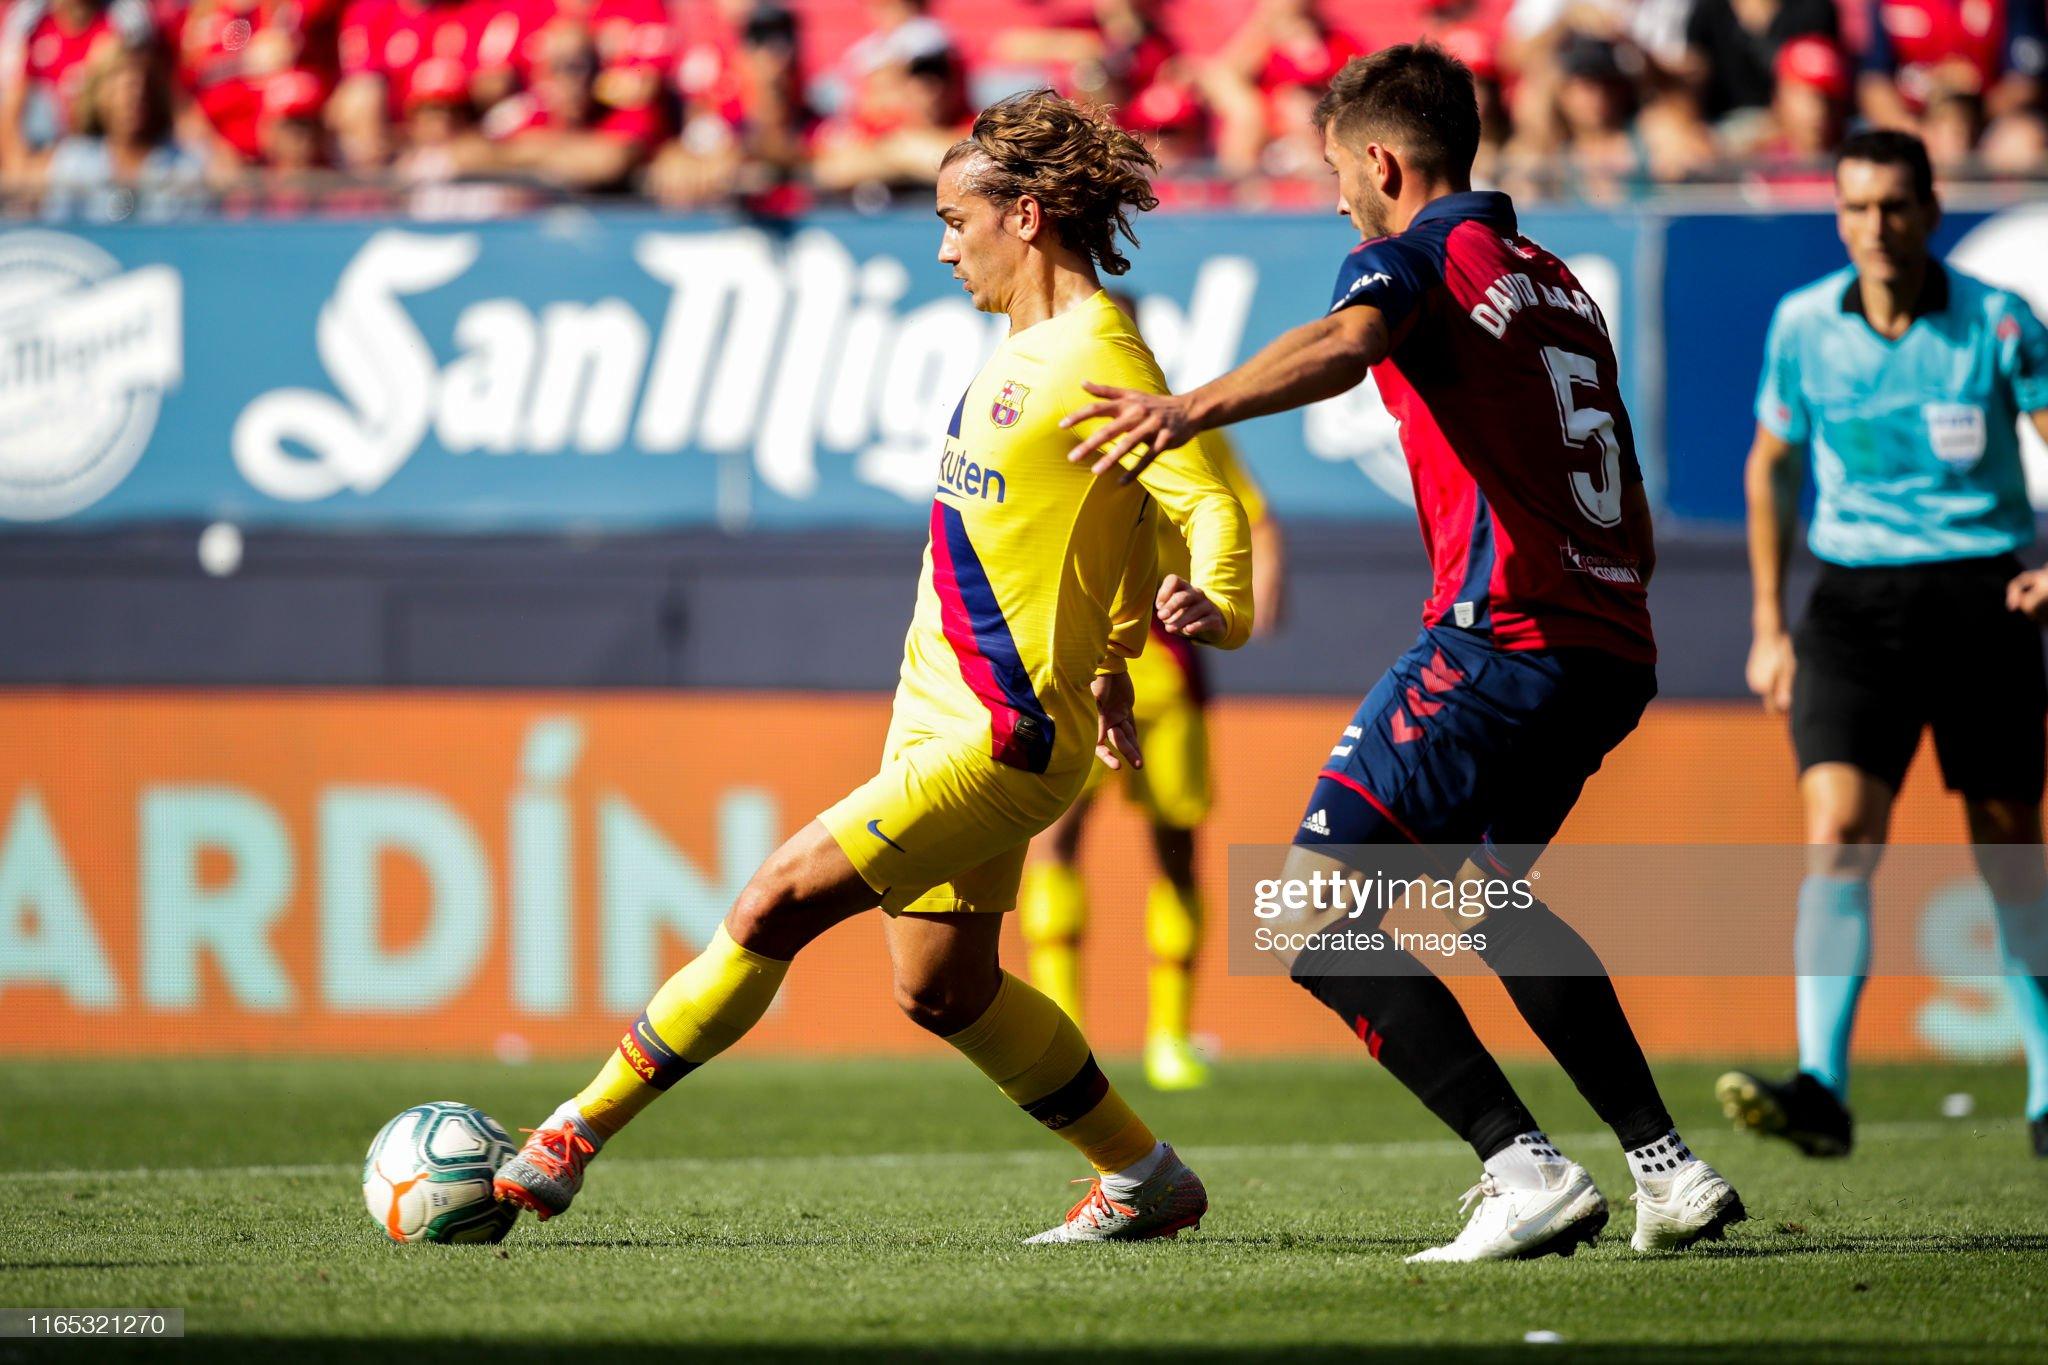 صور مباراة : أوساسونا - برشلونة 2-2 ( 31-08-2019 )  Antoine-griezmann-of-fc-barcelona-david-garcia-of-ca-osasuna-during-picture-id1165321270?s=2048x2048